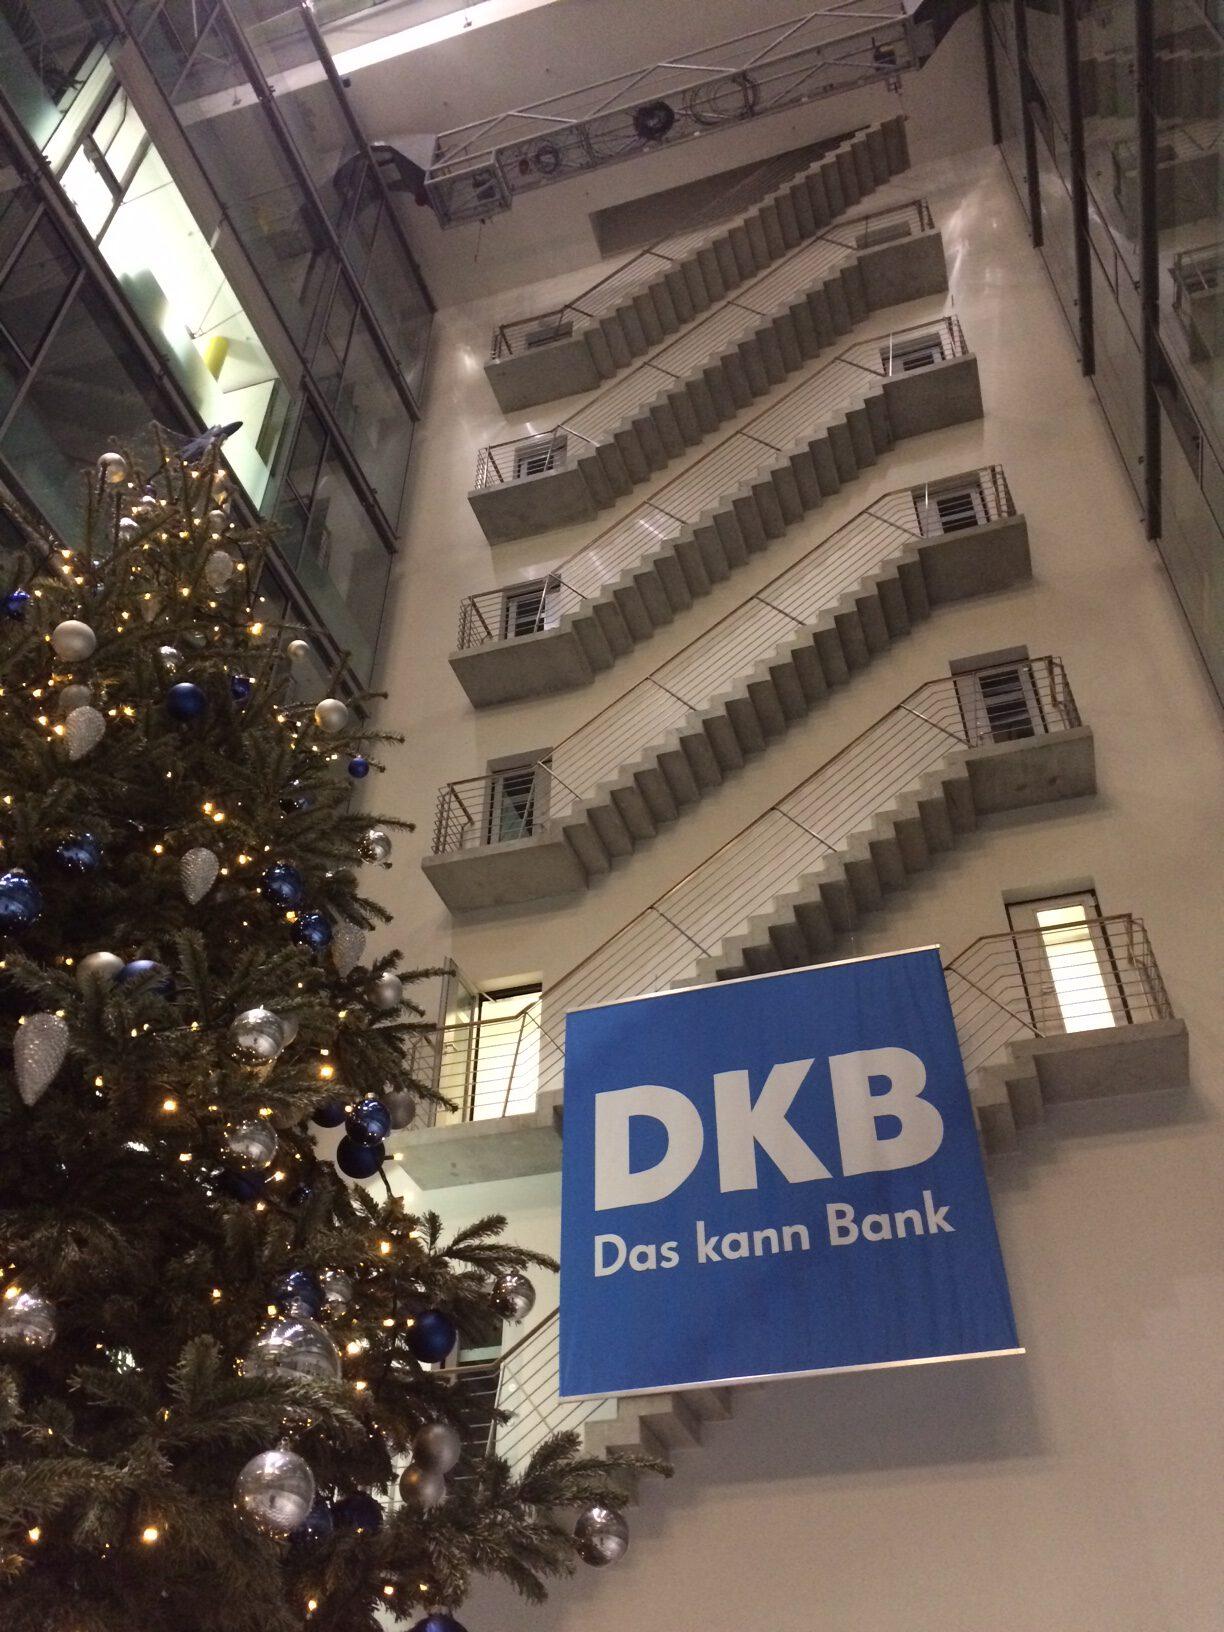 Bank-DKB-Berlin-Tuch-rotated-Matti-Michalke-Berlin-Brandenburg-Aussenwerbung-Innenwerbung-Banner-Planen-Folien-Werbemittel-Druck-Print